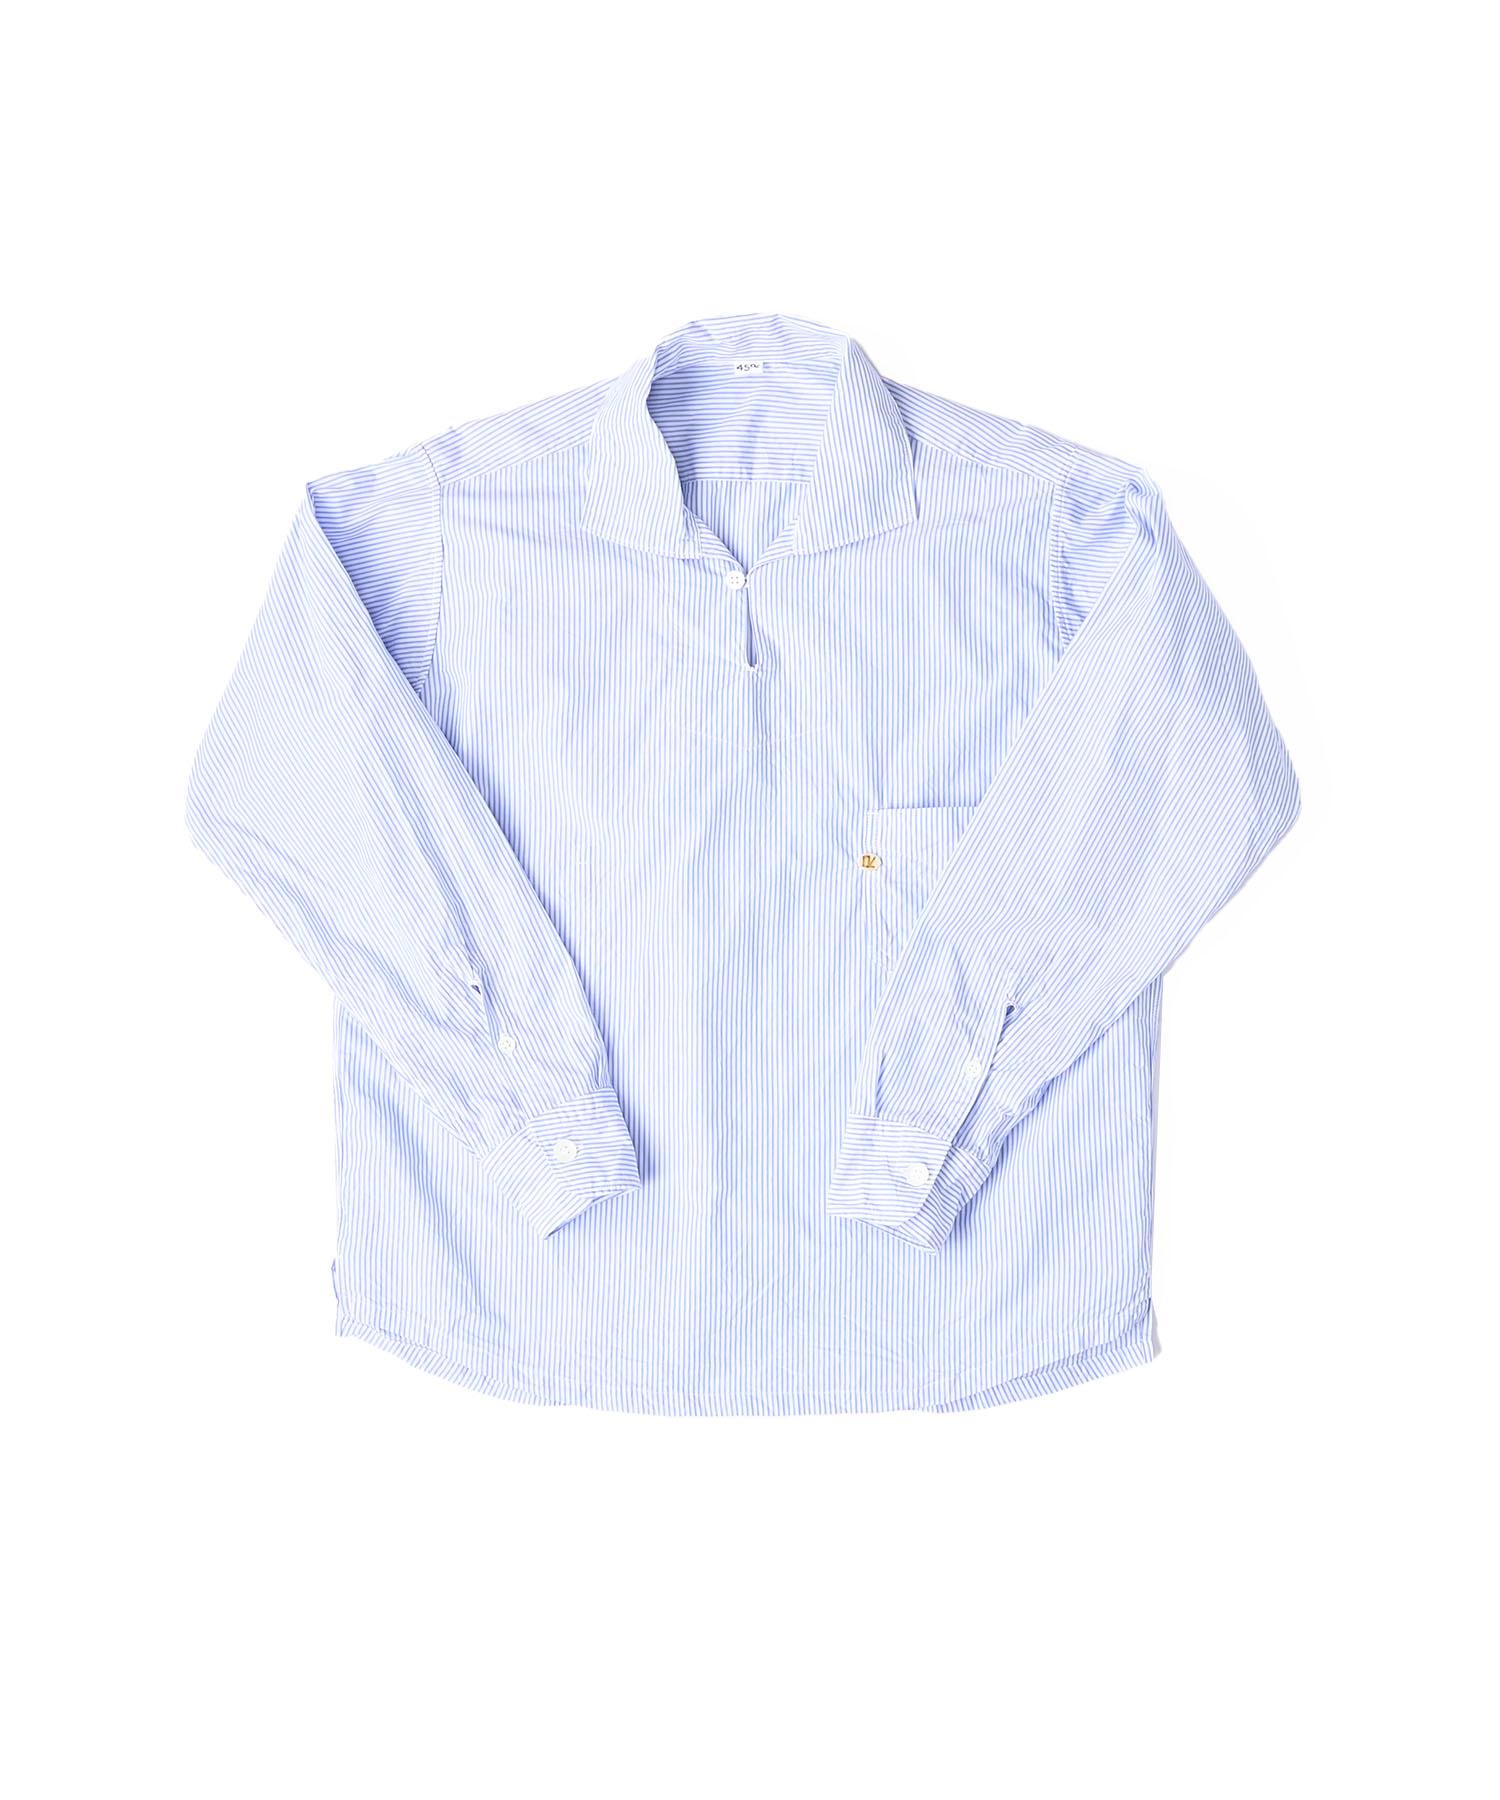 Damp Yarn Dyed 908 Ocean Pullover Shirt (0421)-6